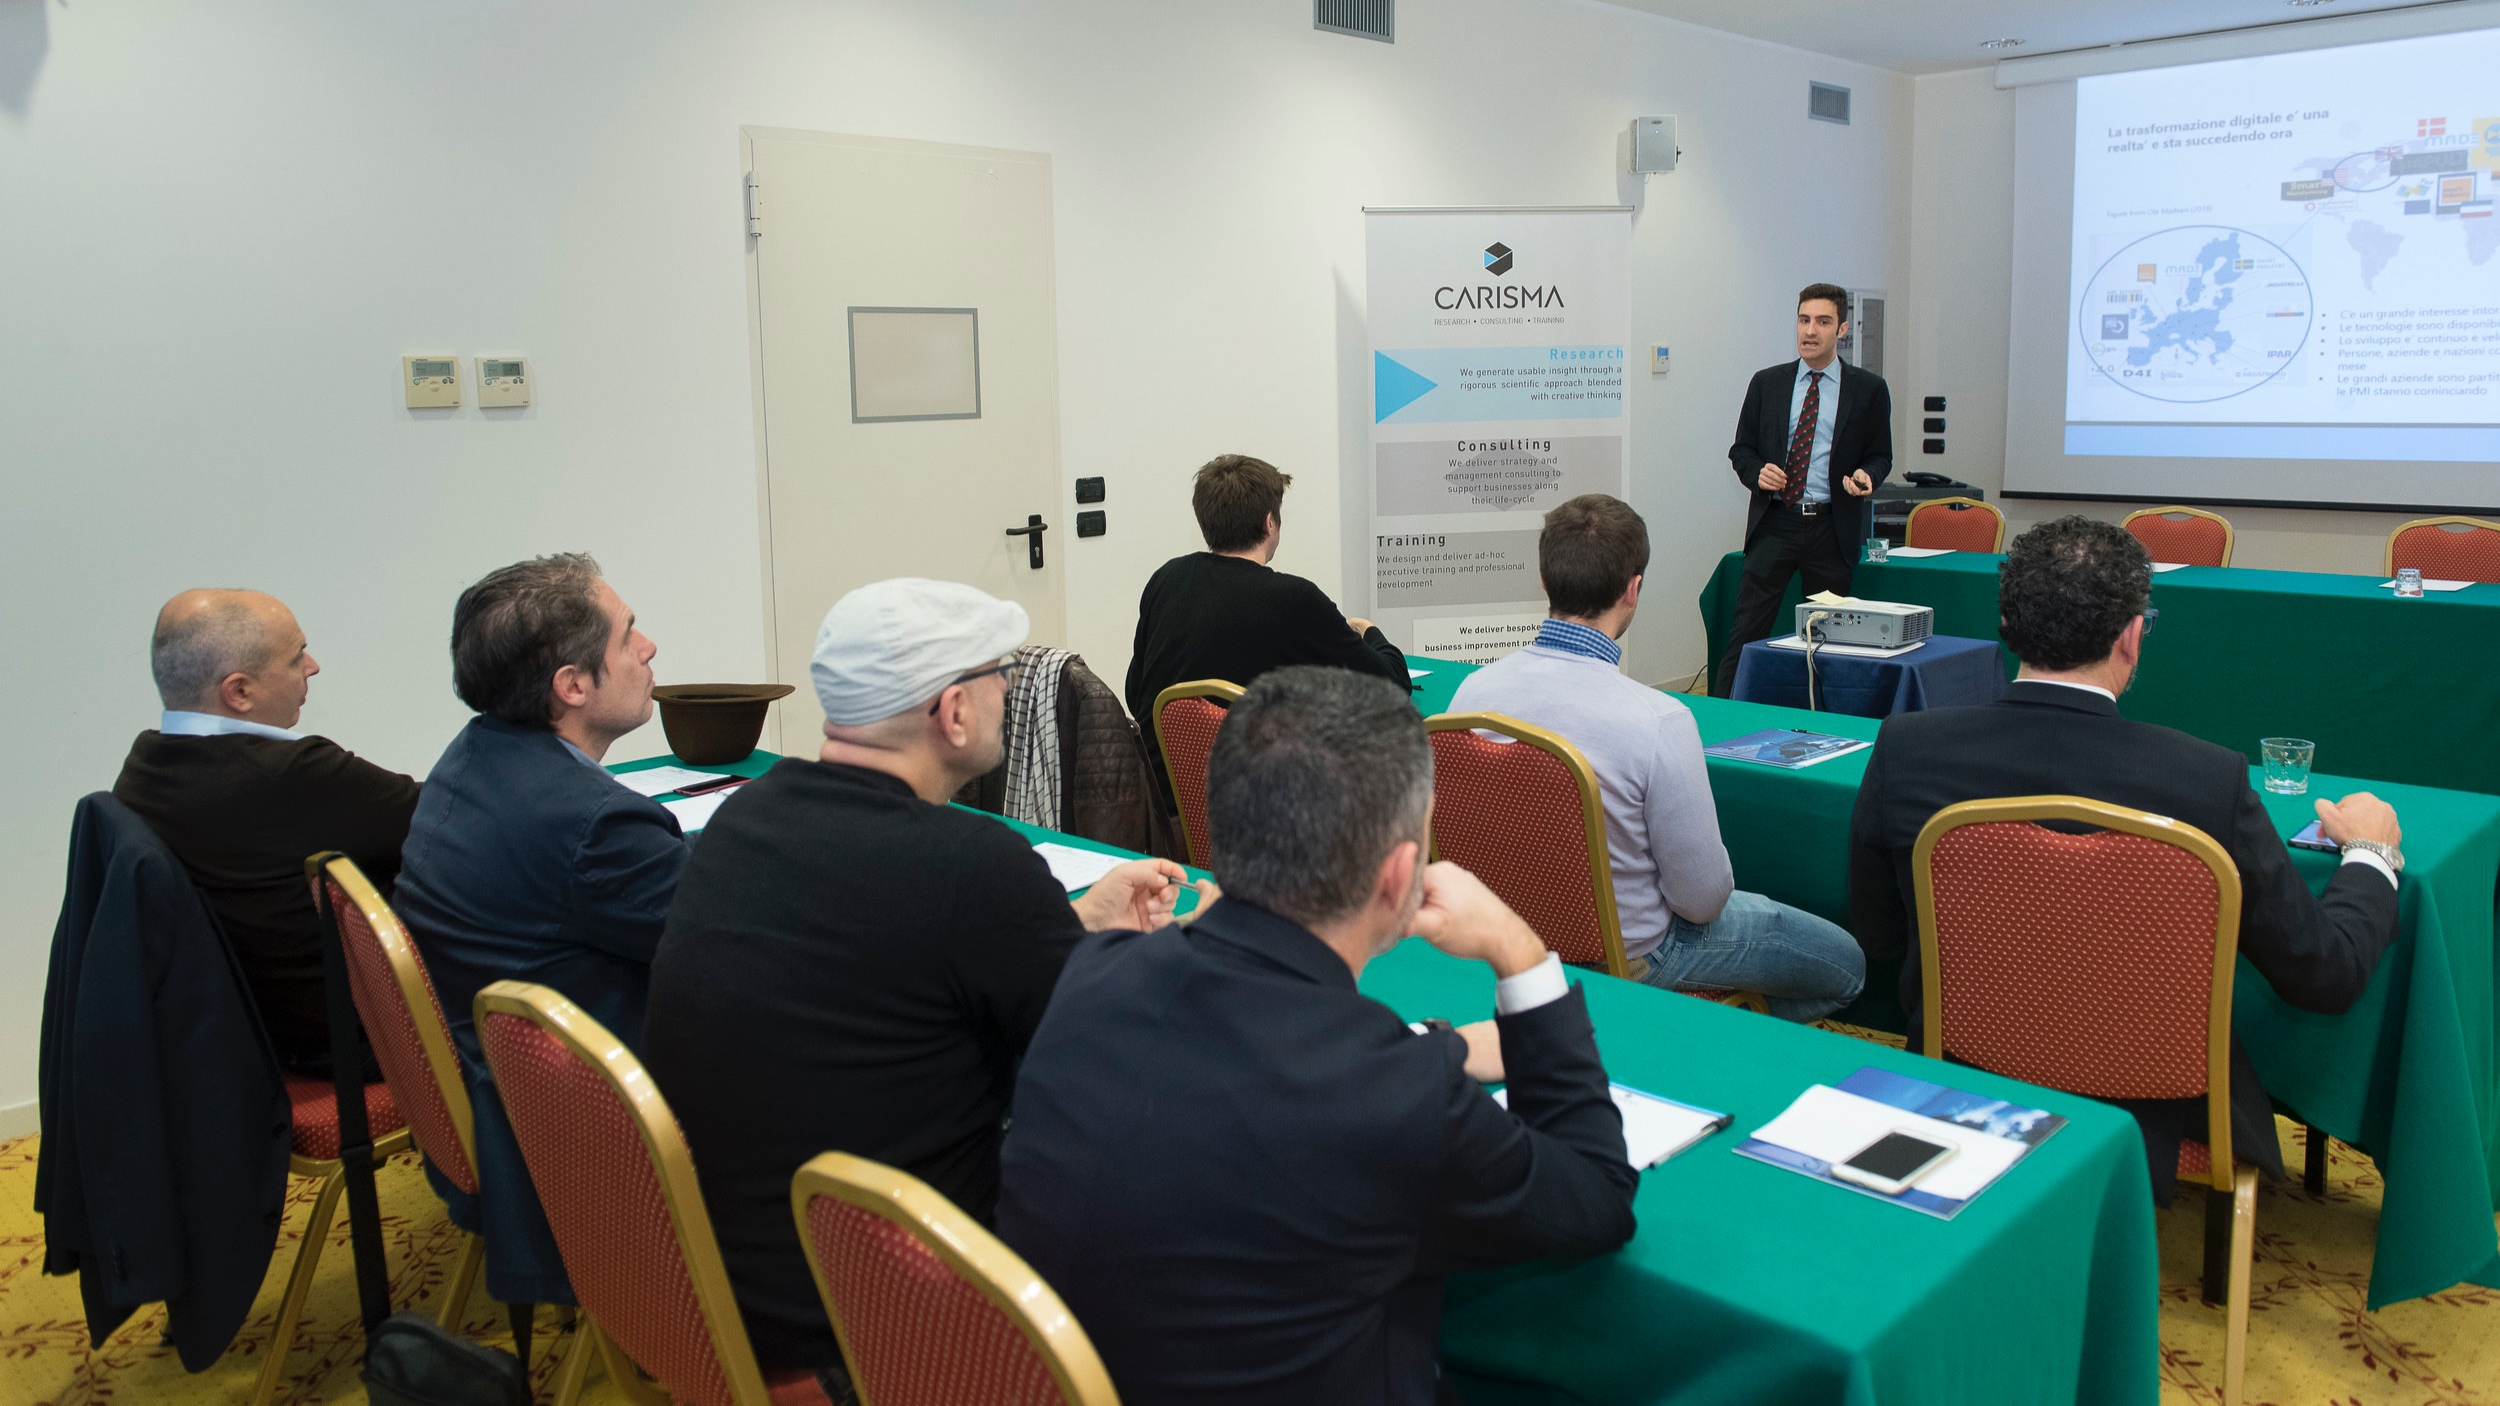 Conferenza-046CARISMA.jpg